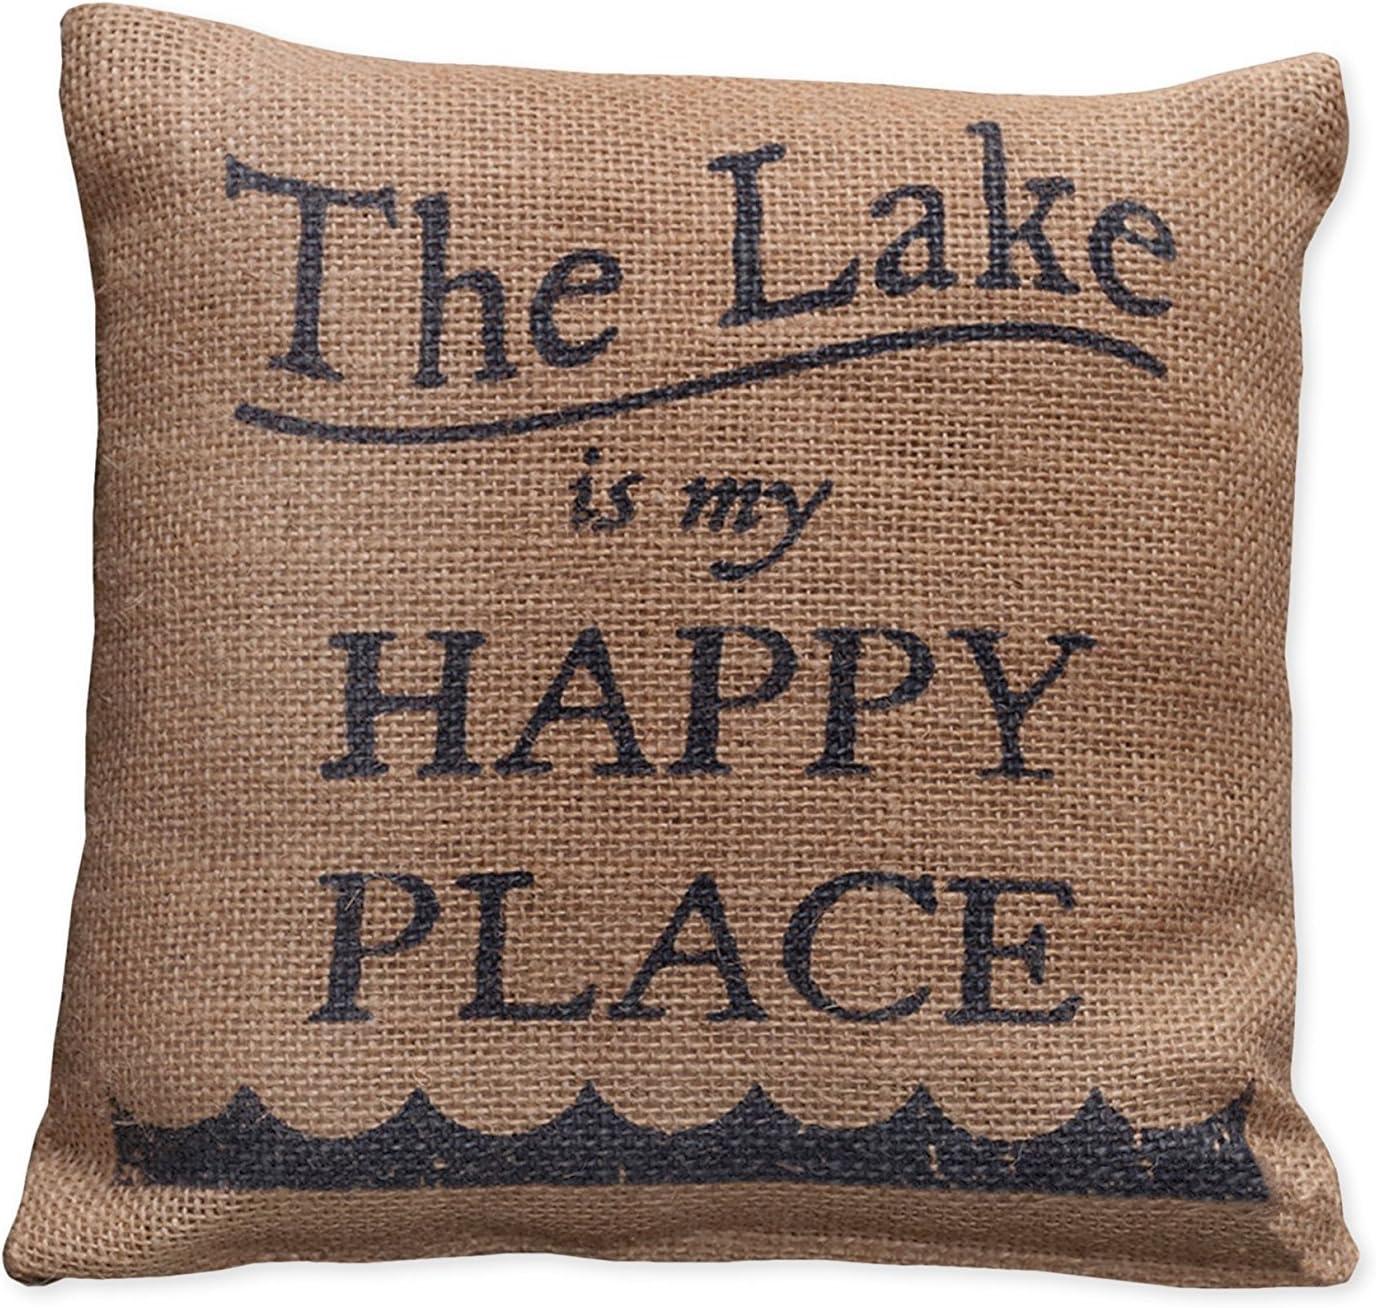 Amazon Com Small Burlap Lake Happy Pillow 8x8 Home Kitchen